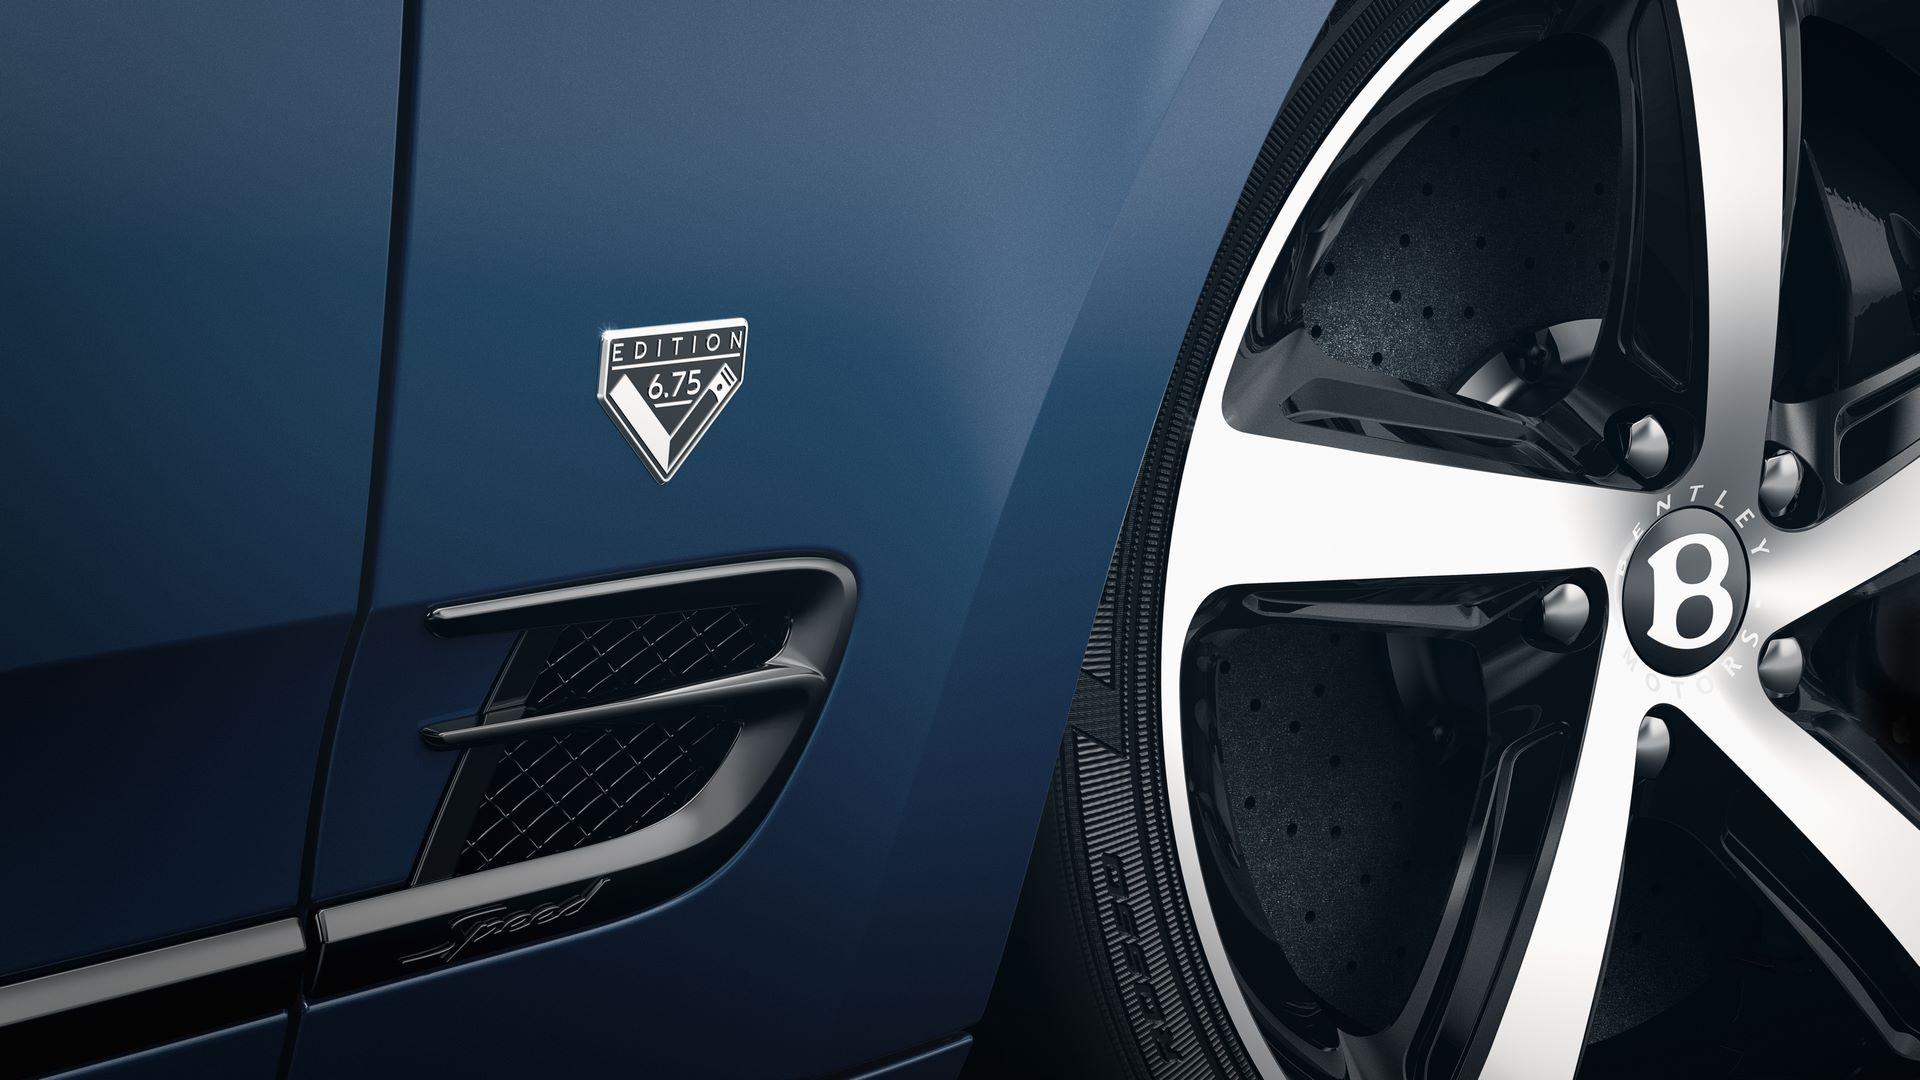 Bentley-Mulsanne-6.75-Edition-By-Mulliner-5